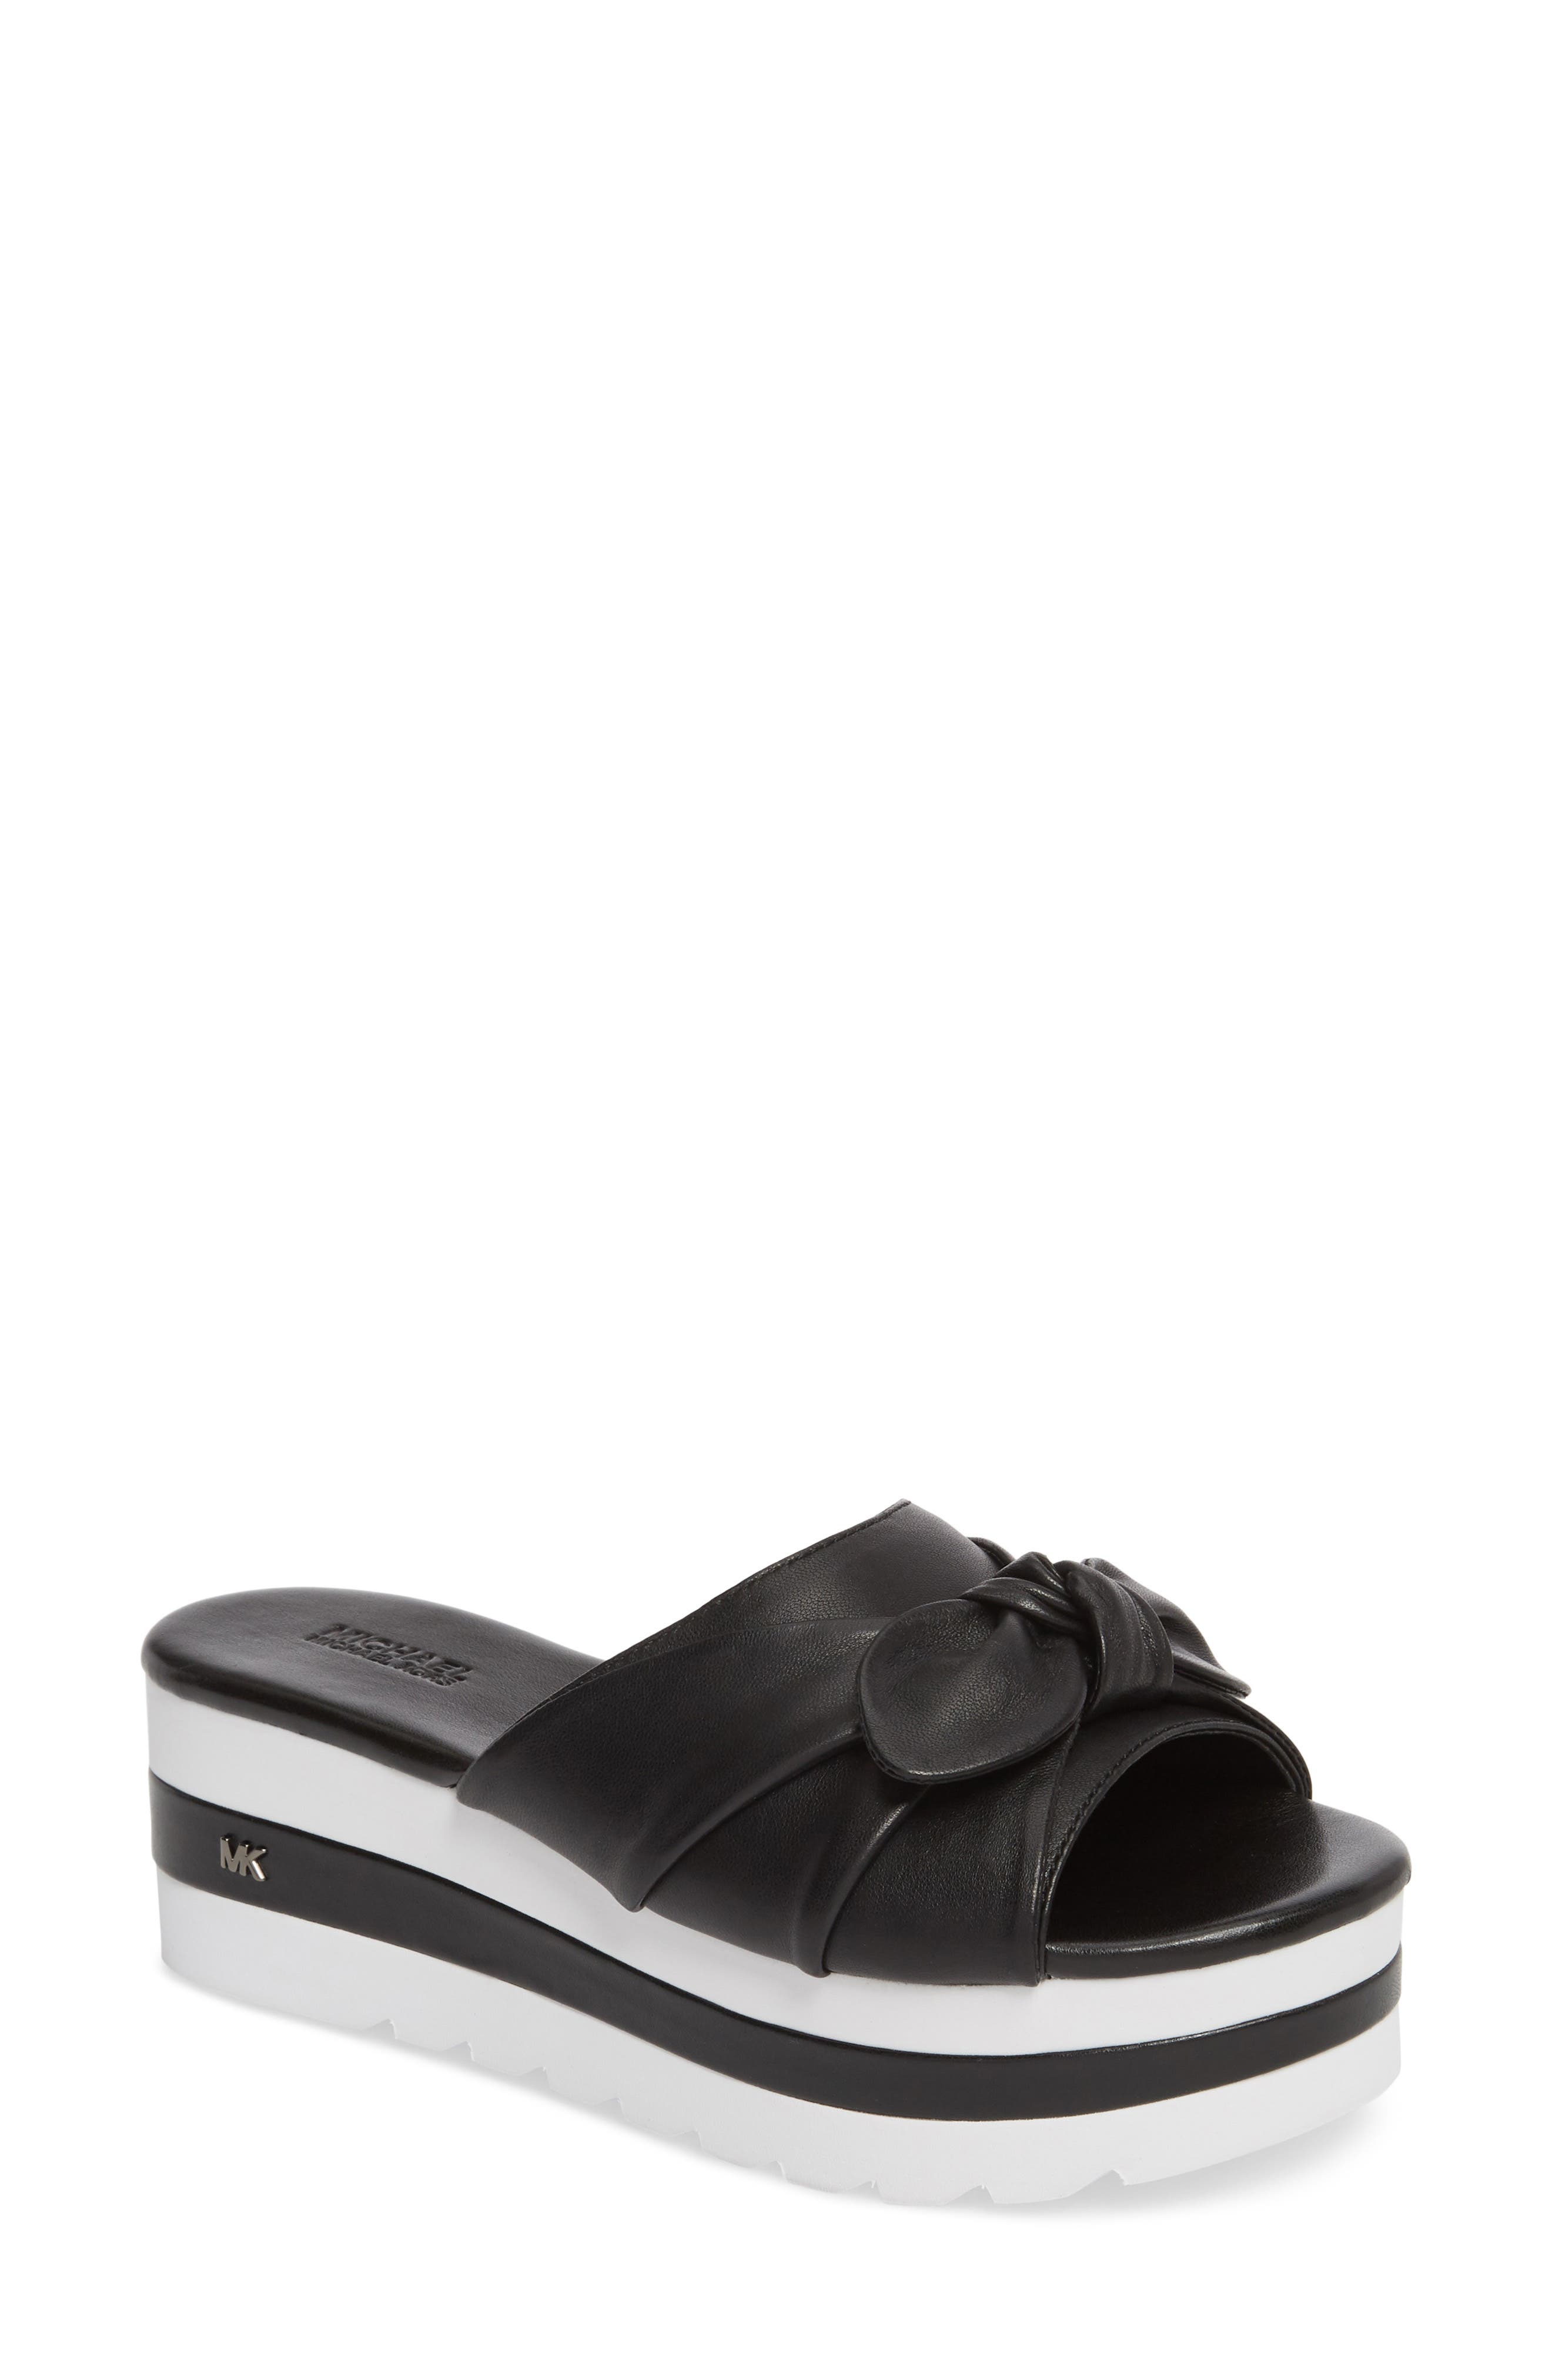 MICHAEL MICHAEL KORS Pippa Platform Slide Sandal, Main, color, 001